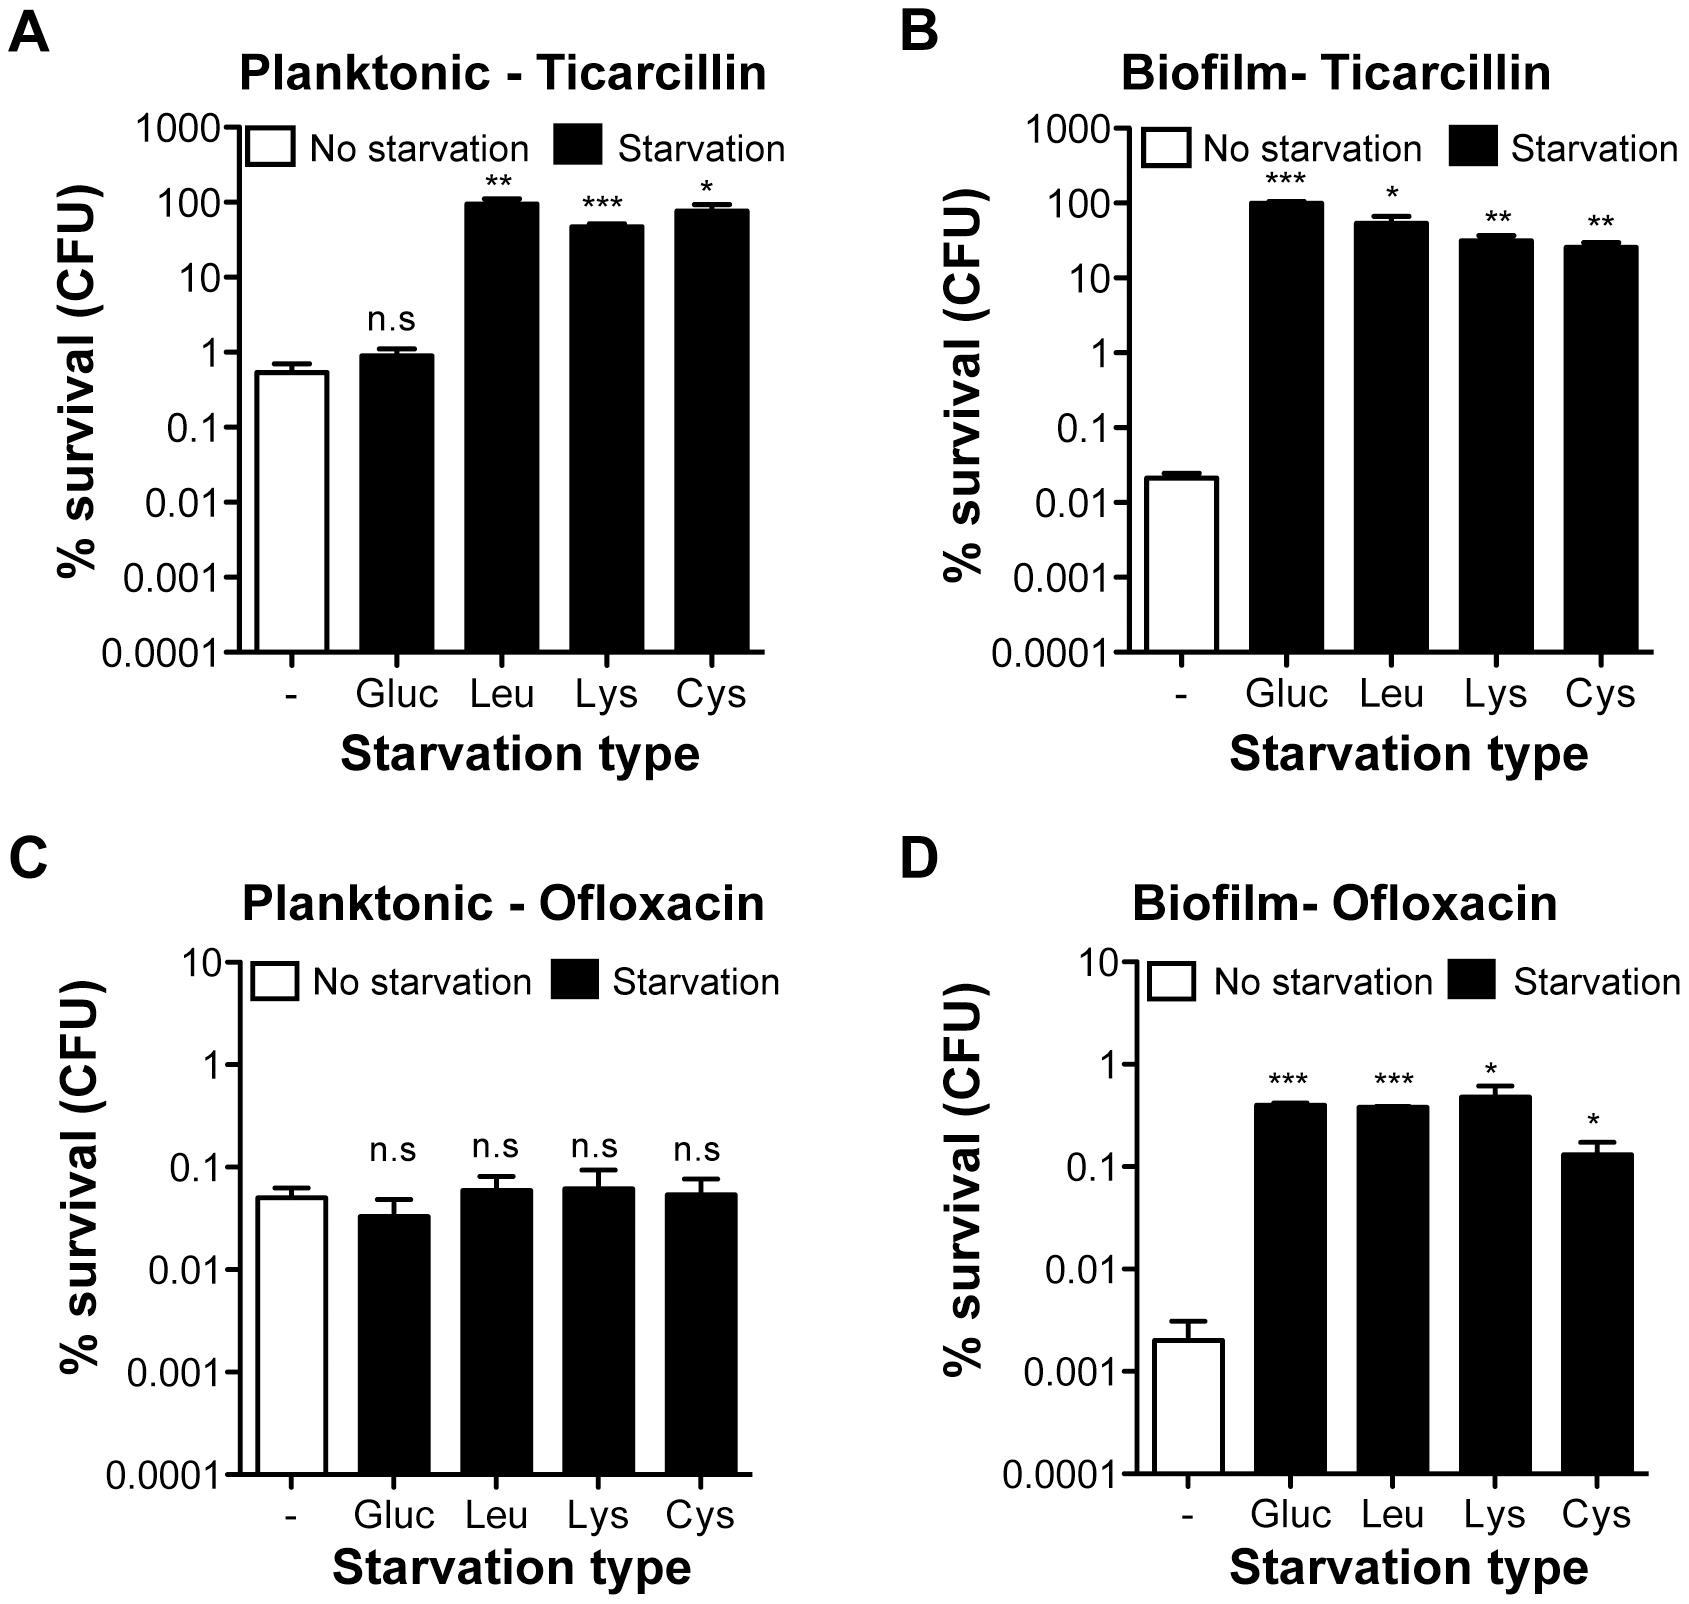 Antibiotic tolerance profile of starved planktonic and biofilm bacteria.